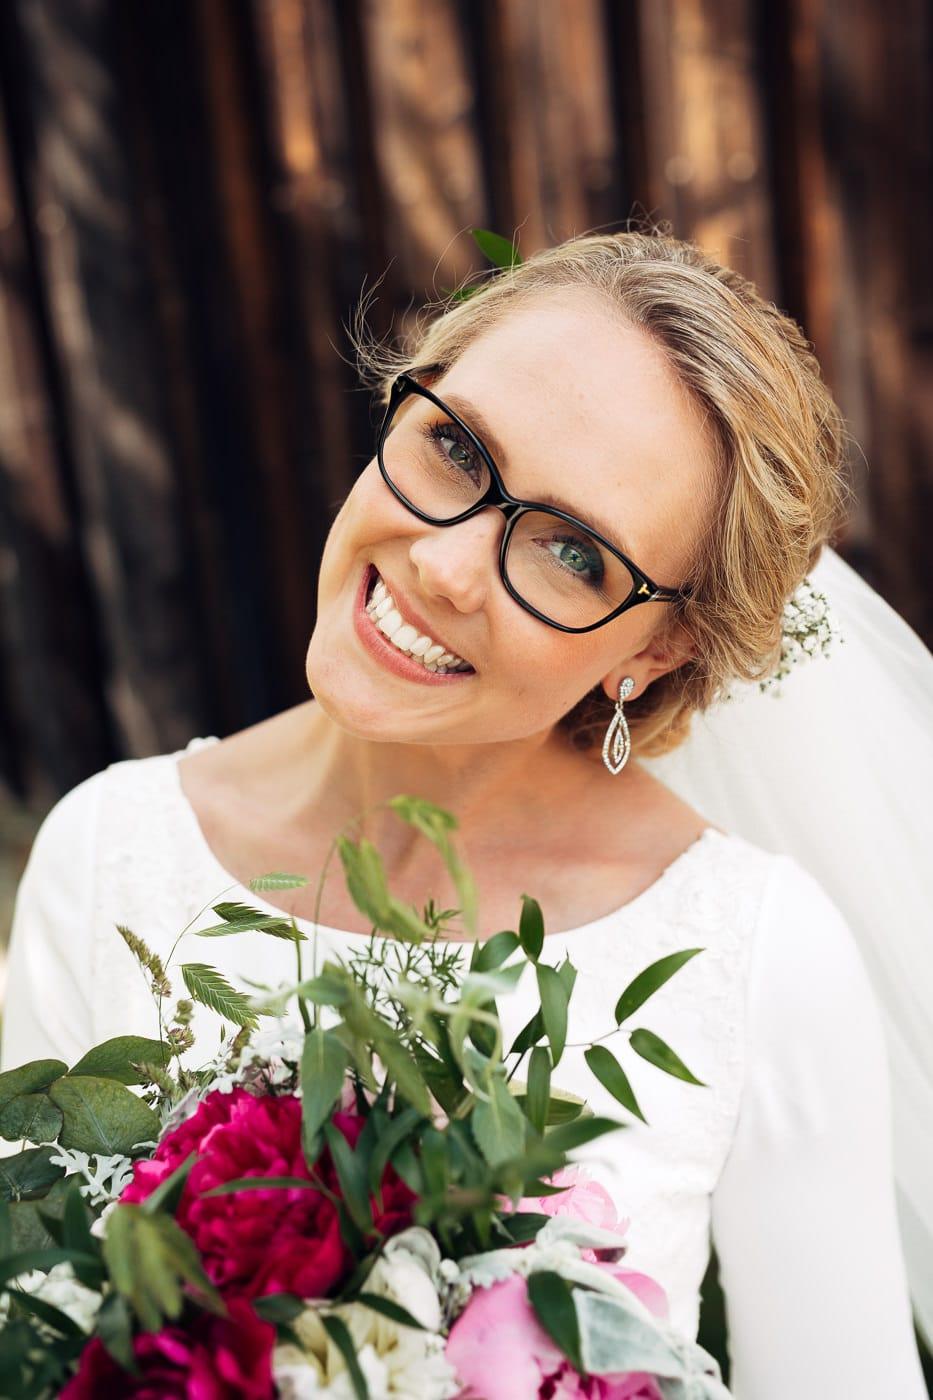 Karoline & Andreas - bryllup i Østfold med magiske detaljer Bryllup Fredrikstad Fotograf 33